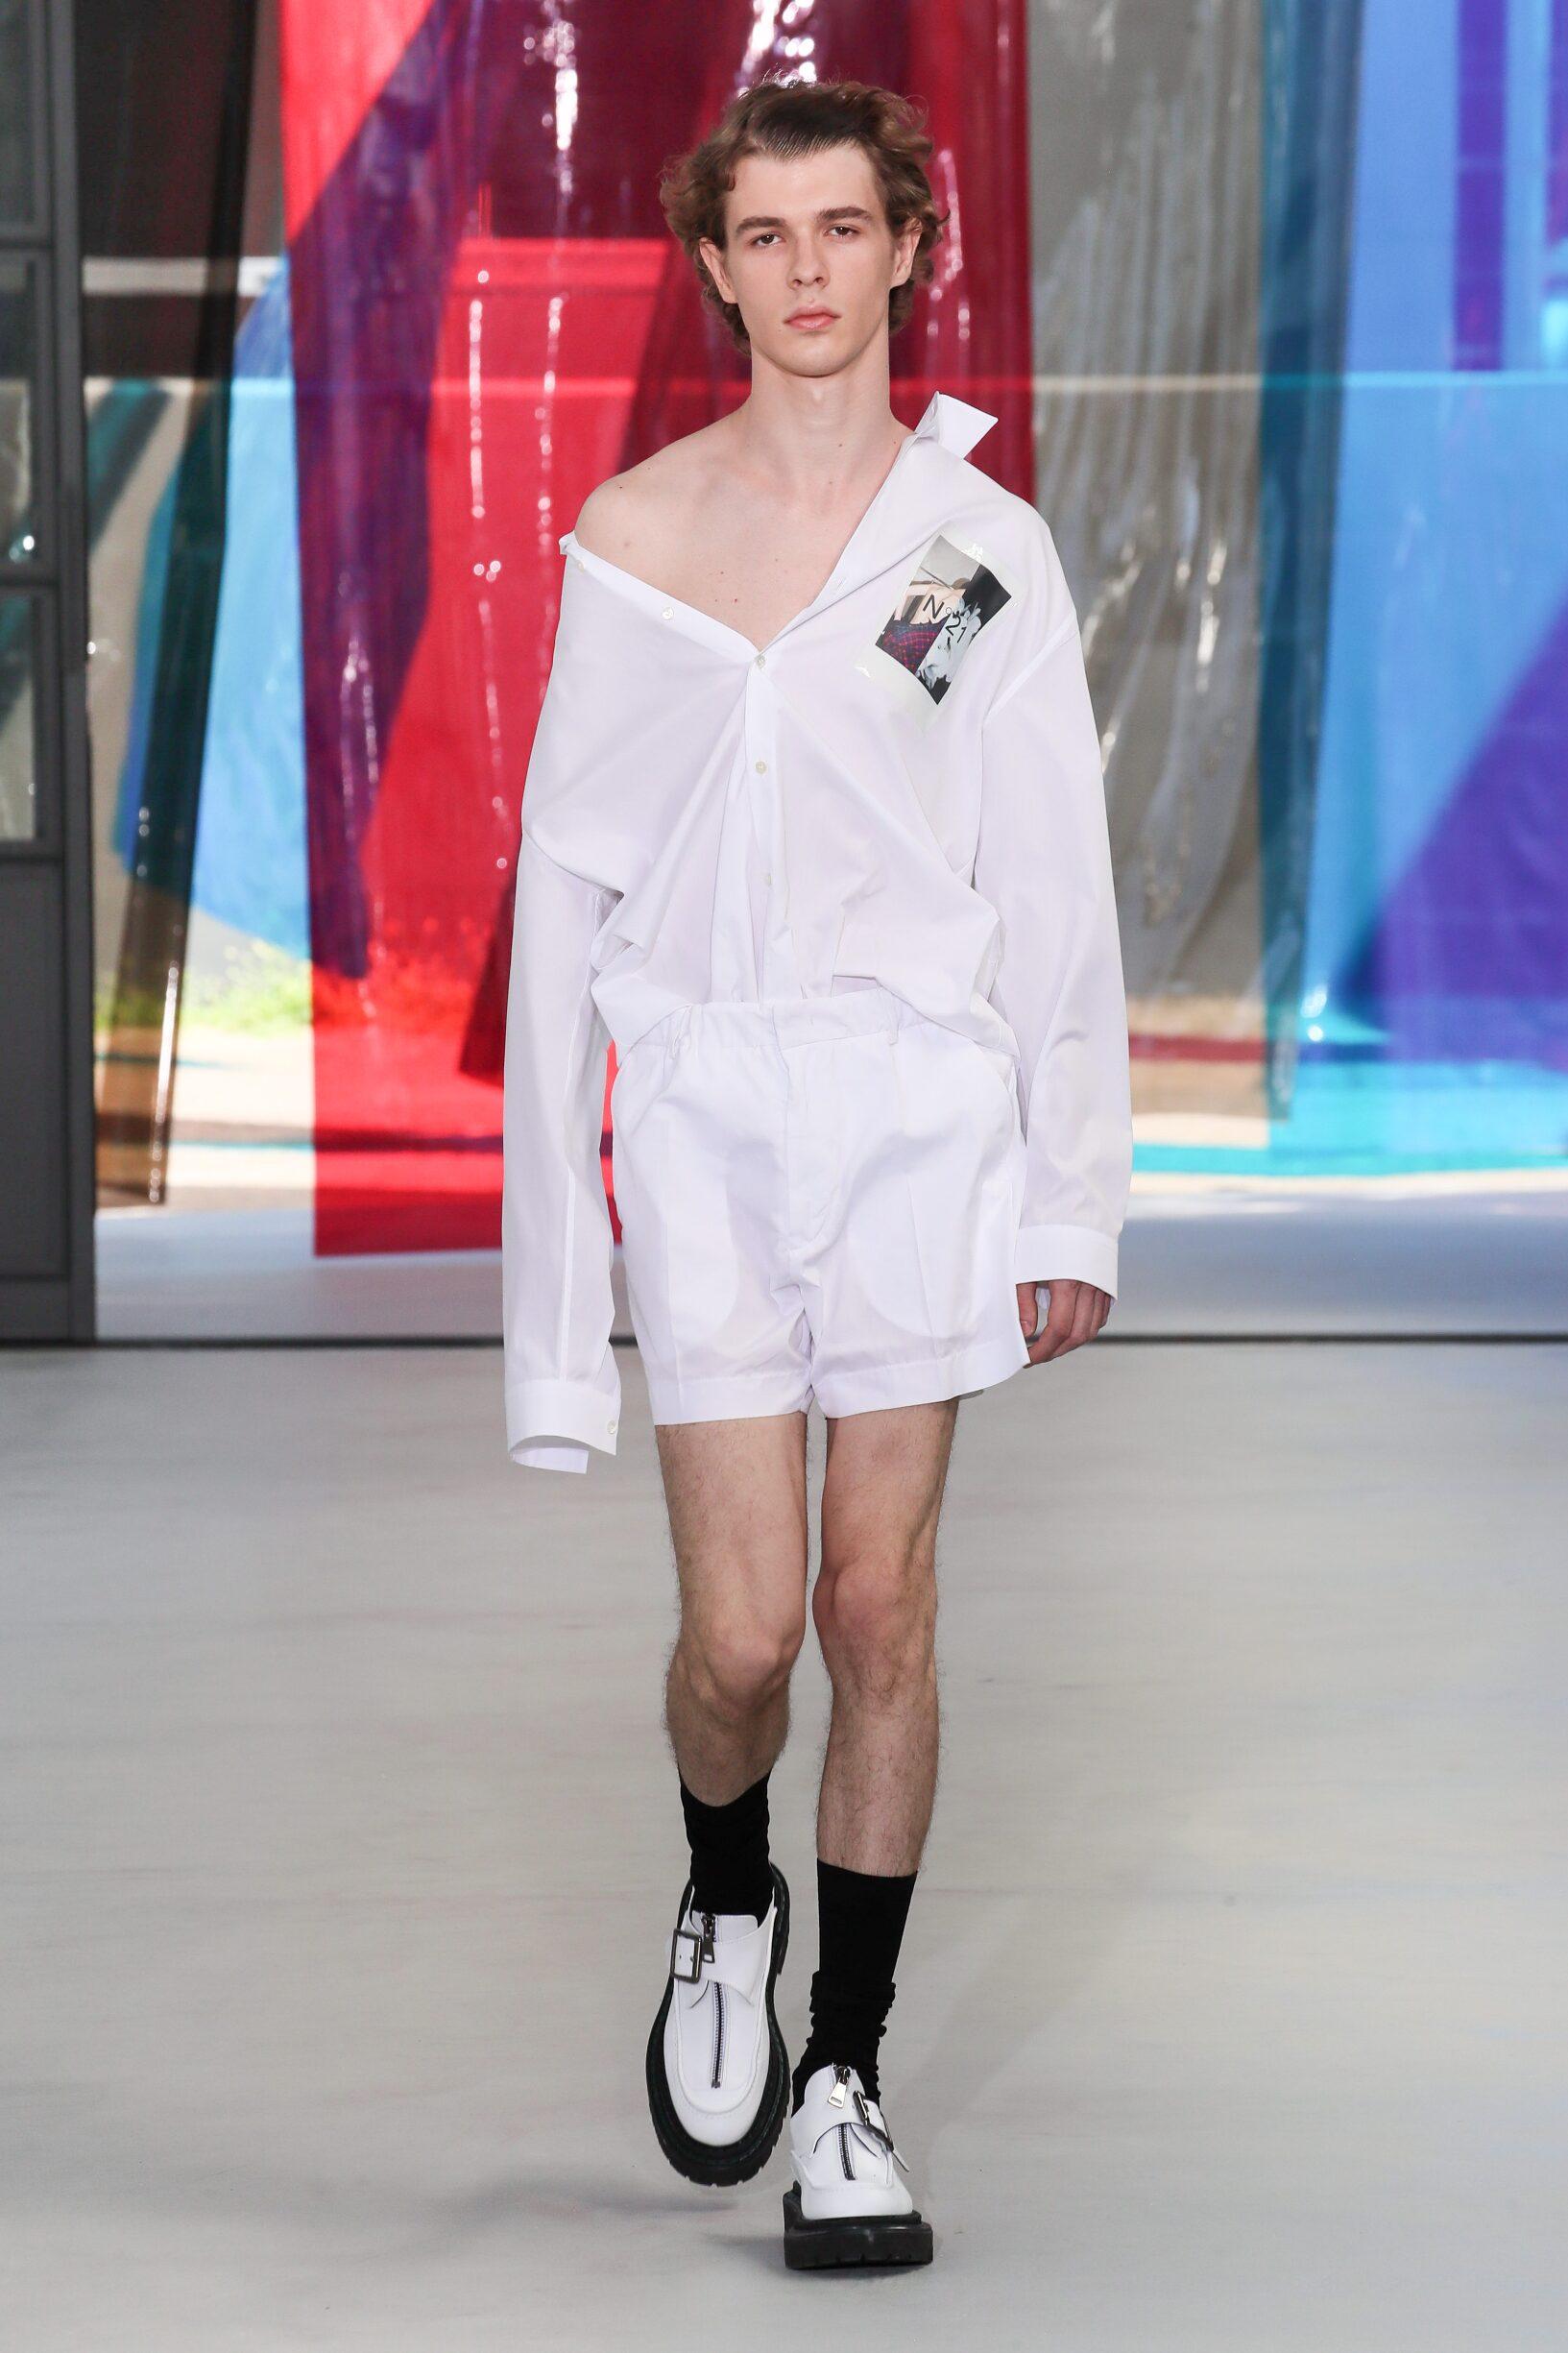 Spring Fashion Trends 2019 N°21